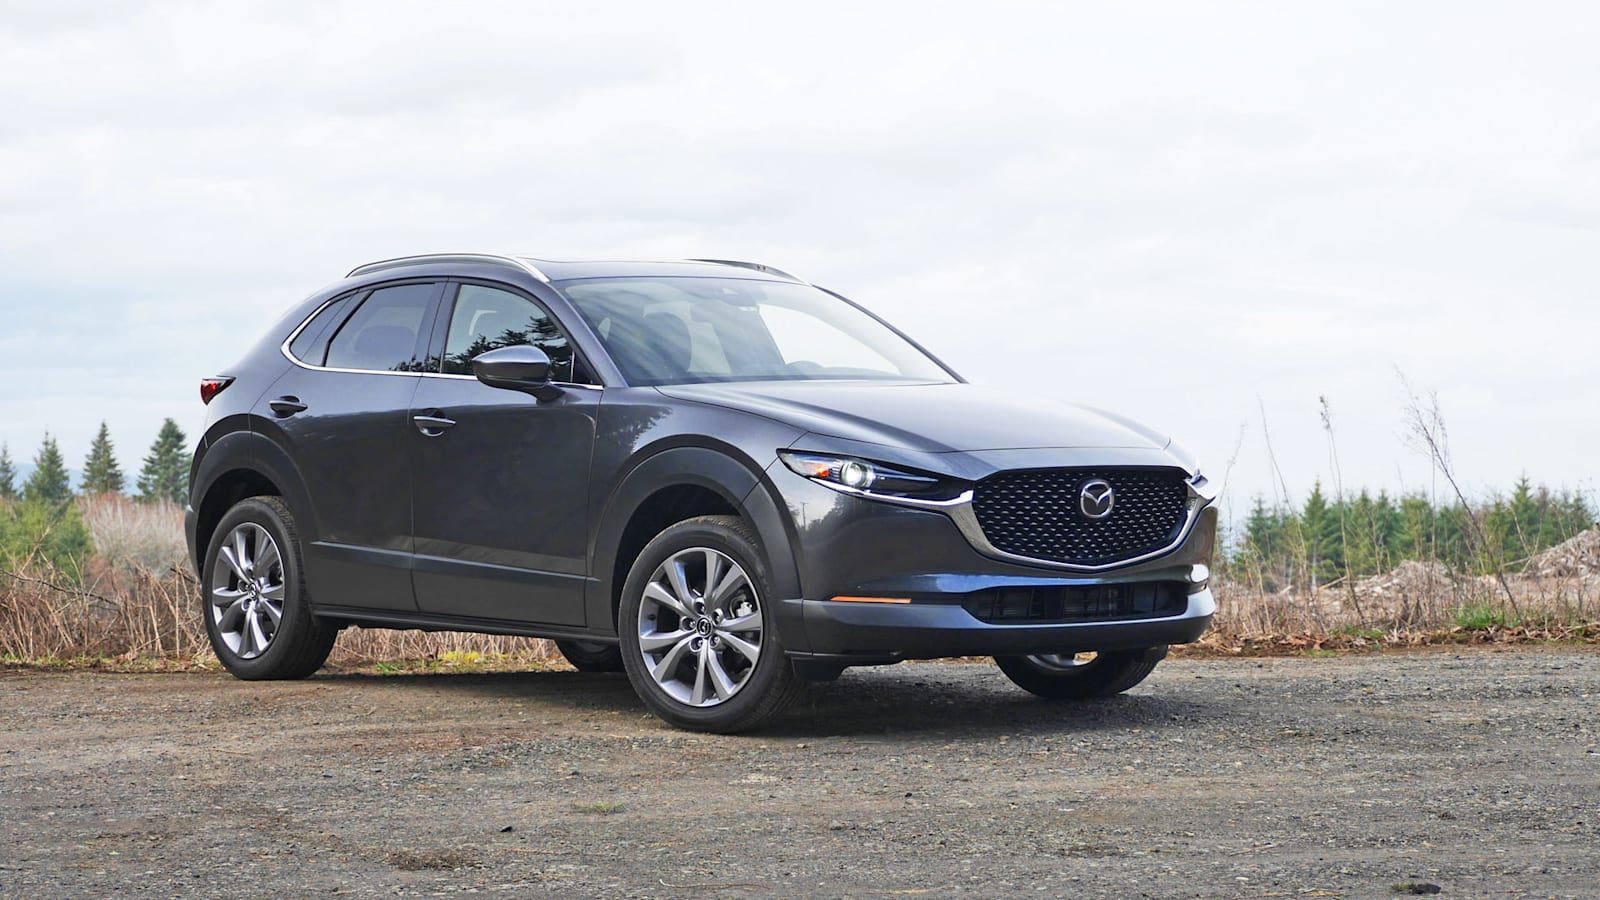 2021 Mazda CX-30 Grand Touring in gray